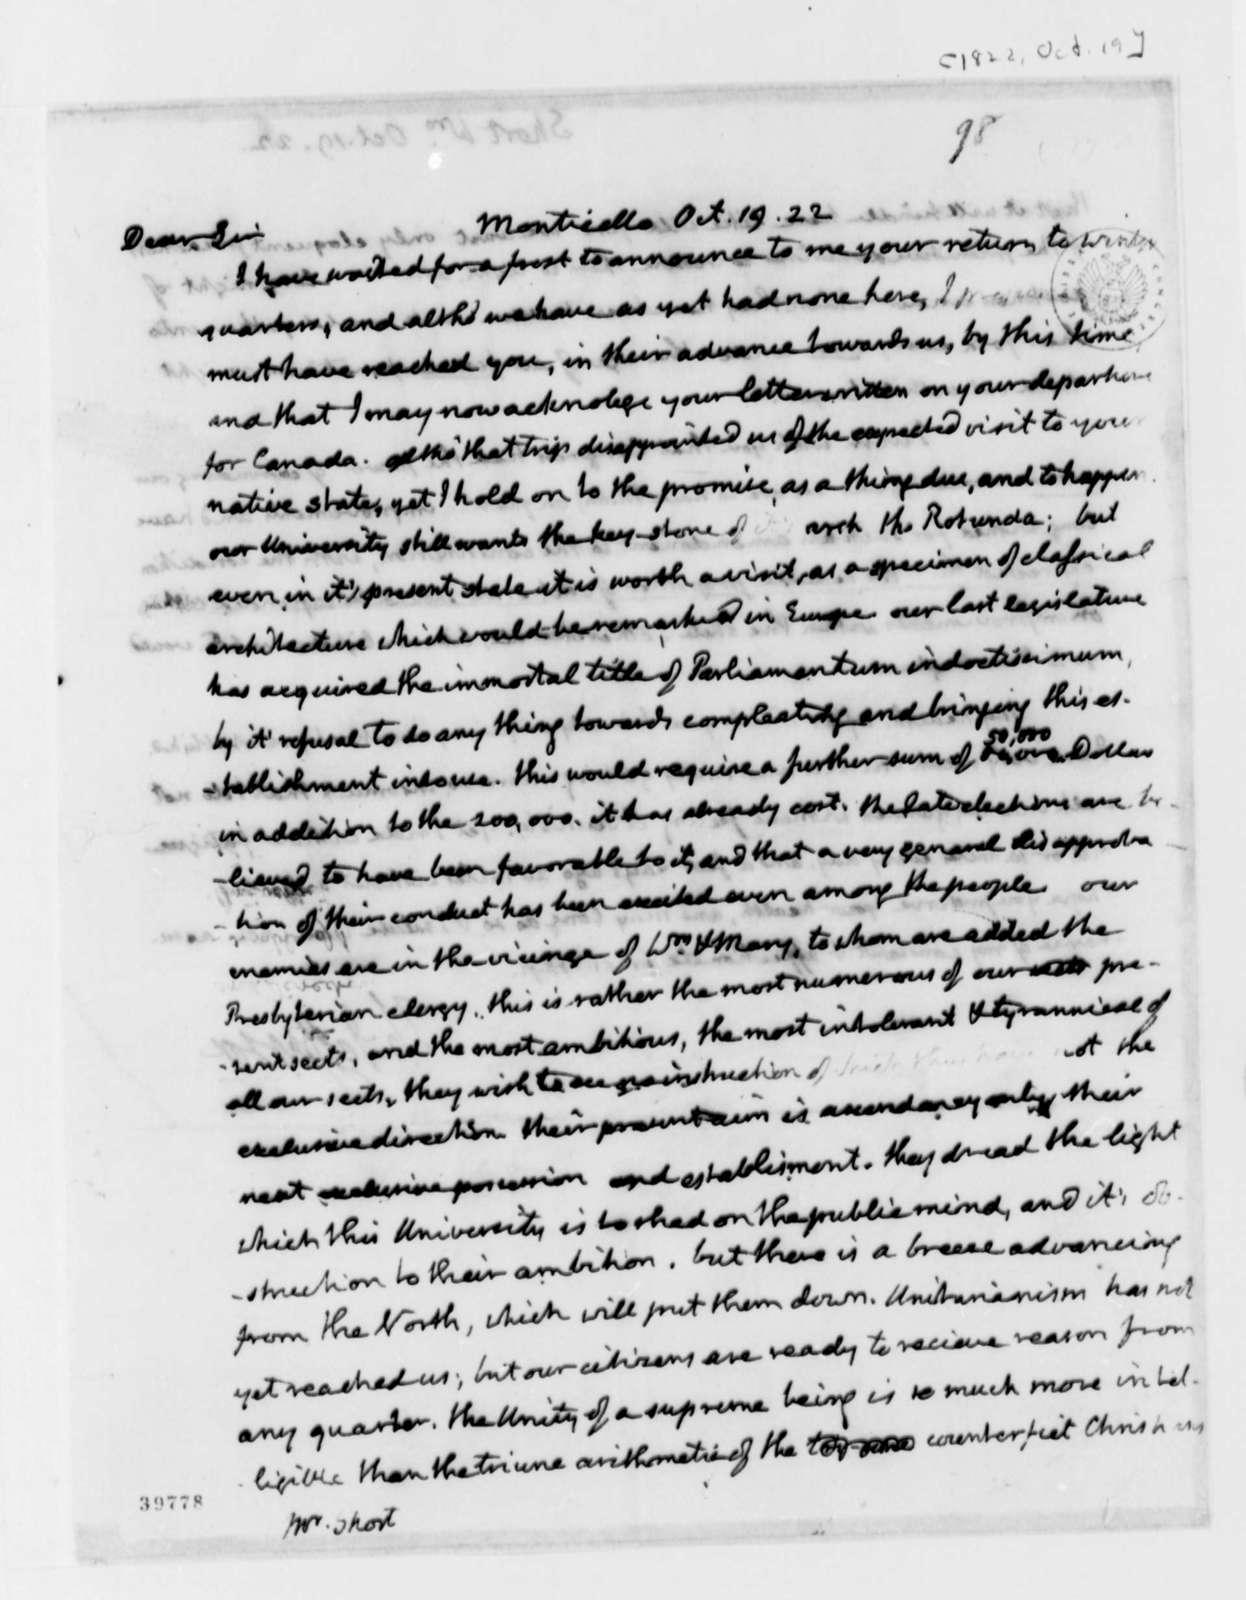 Thomas Jefferson to William Short, October 19, 1822